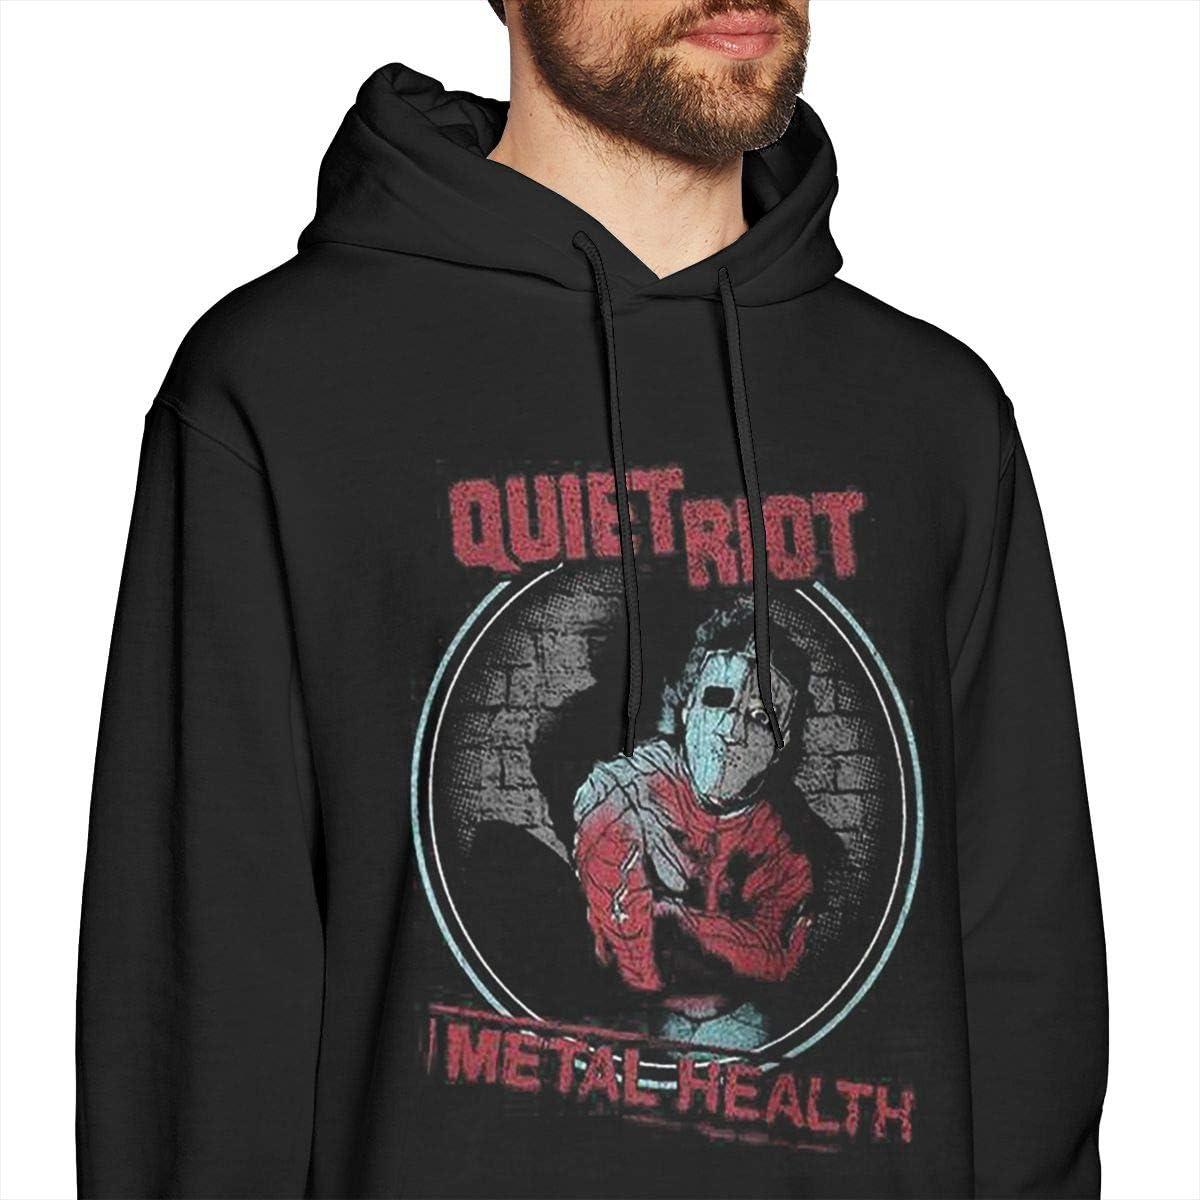 COURTNEY FRANCIS Quiet Riot Cool Mens Long Sleeve Sweatshirts Mans Hoodies Black